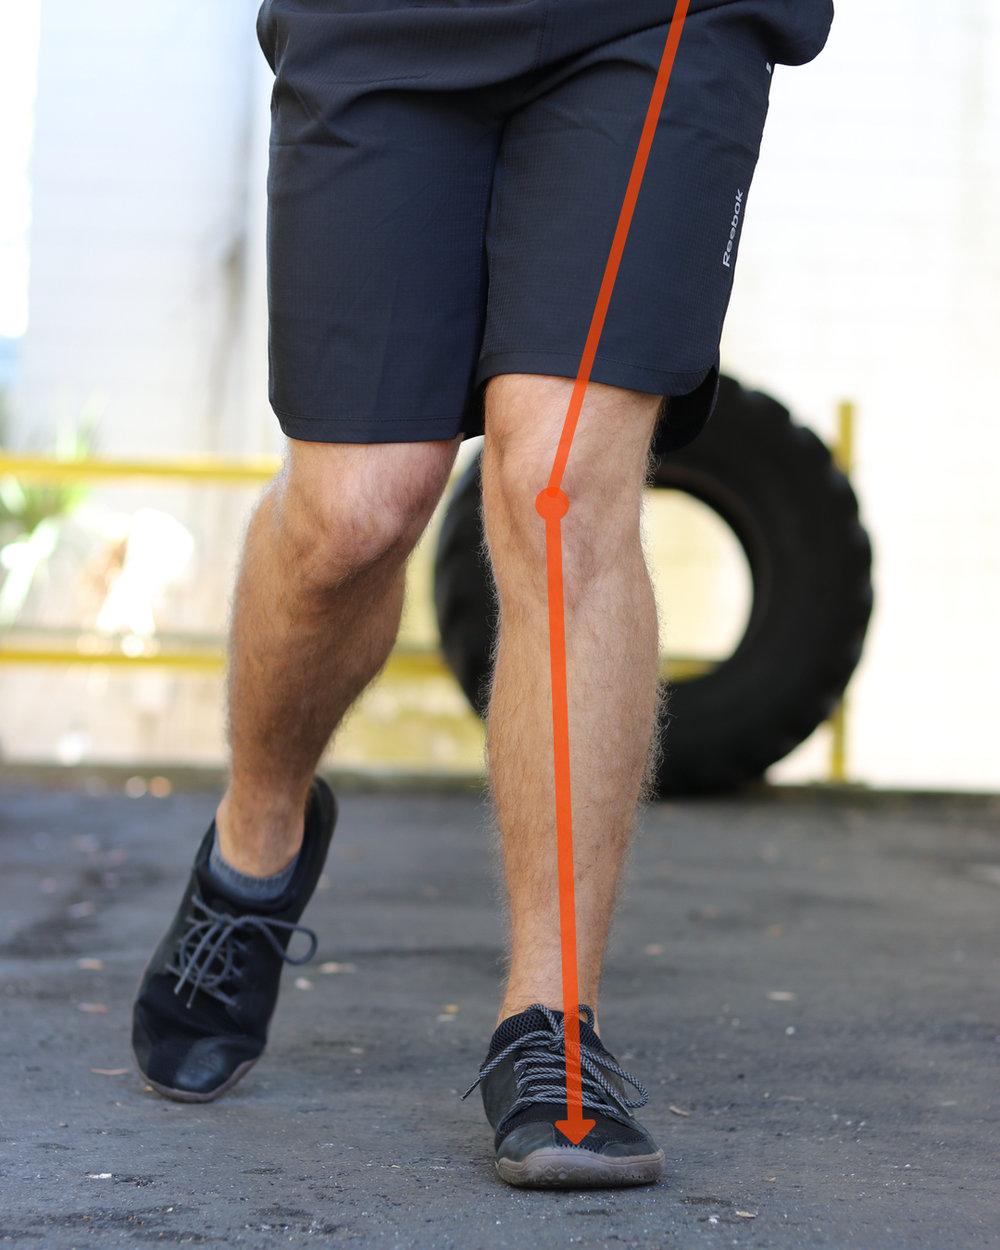 Valgus Fault - Knee Collapse